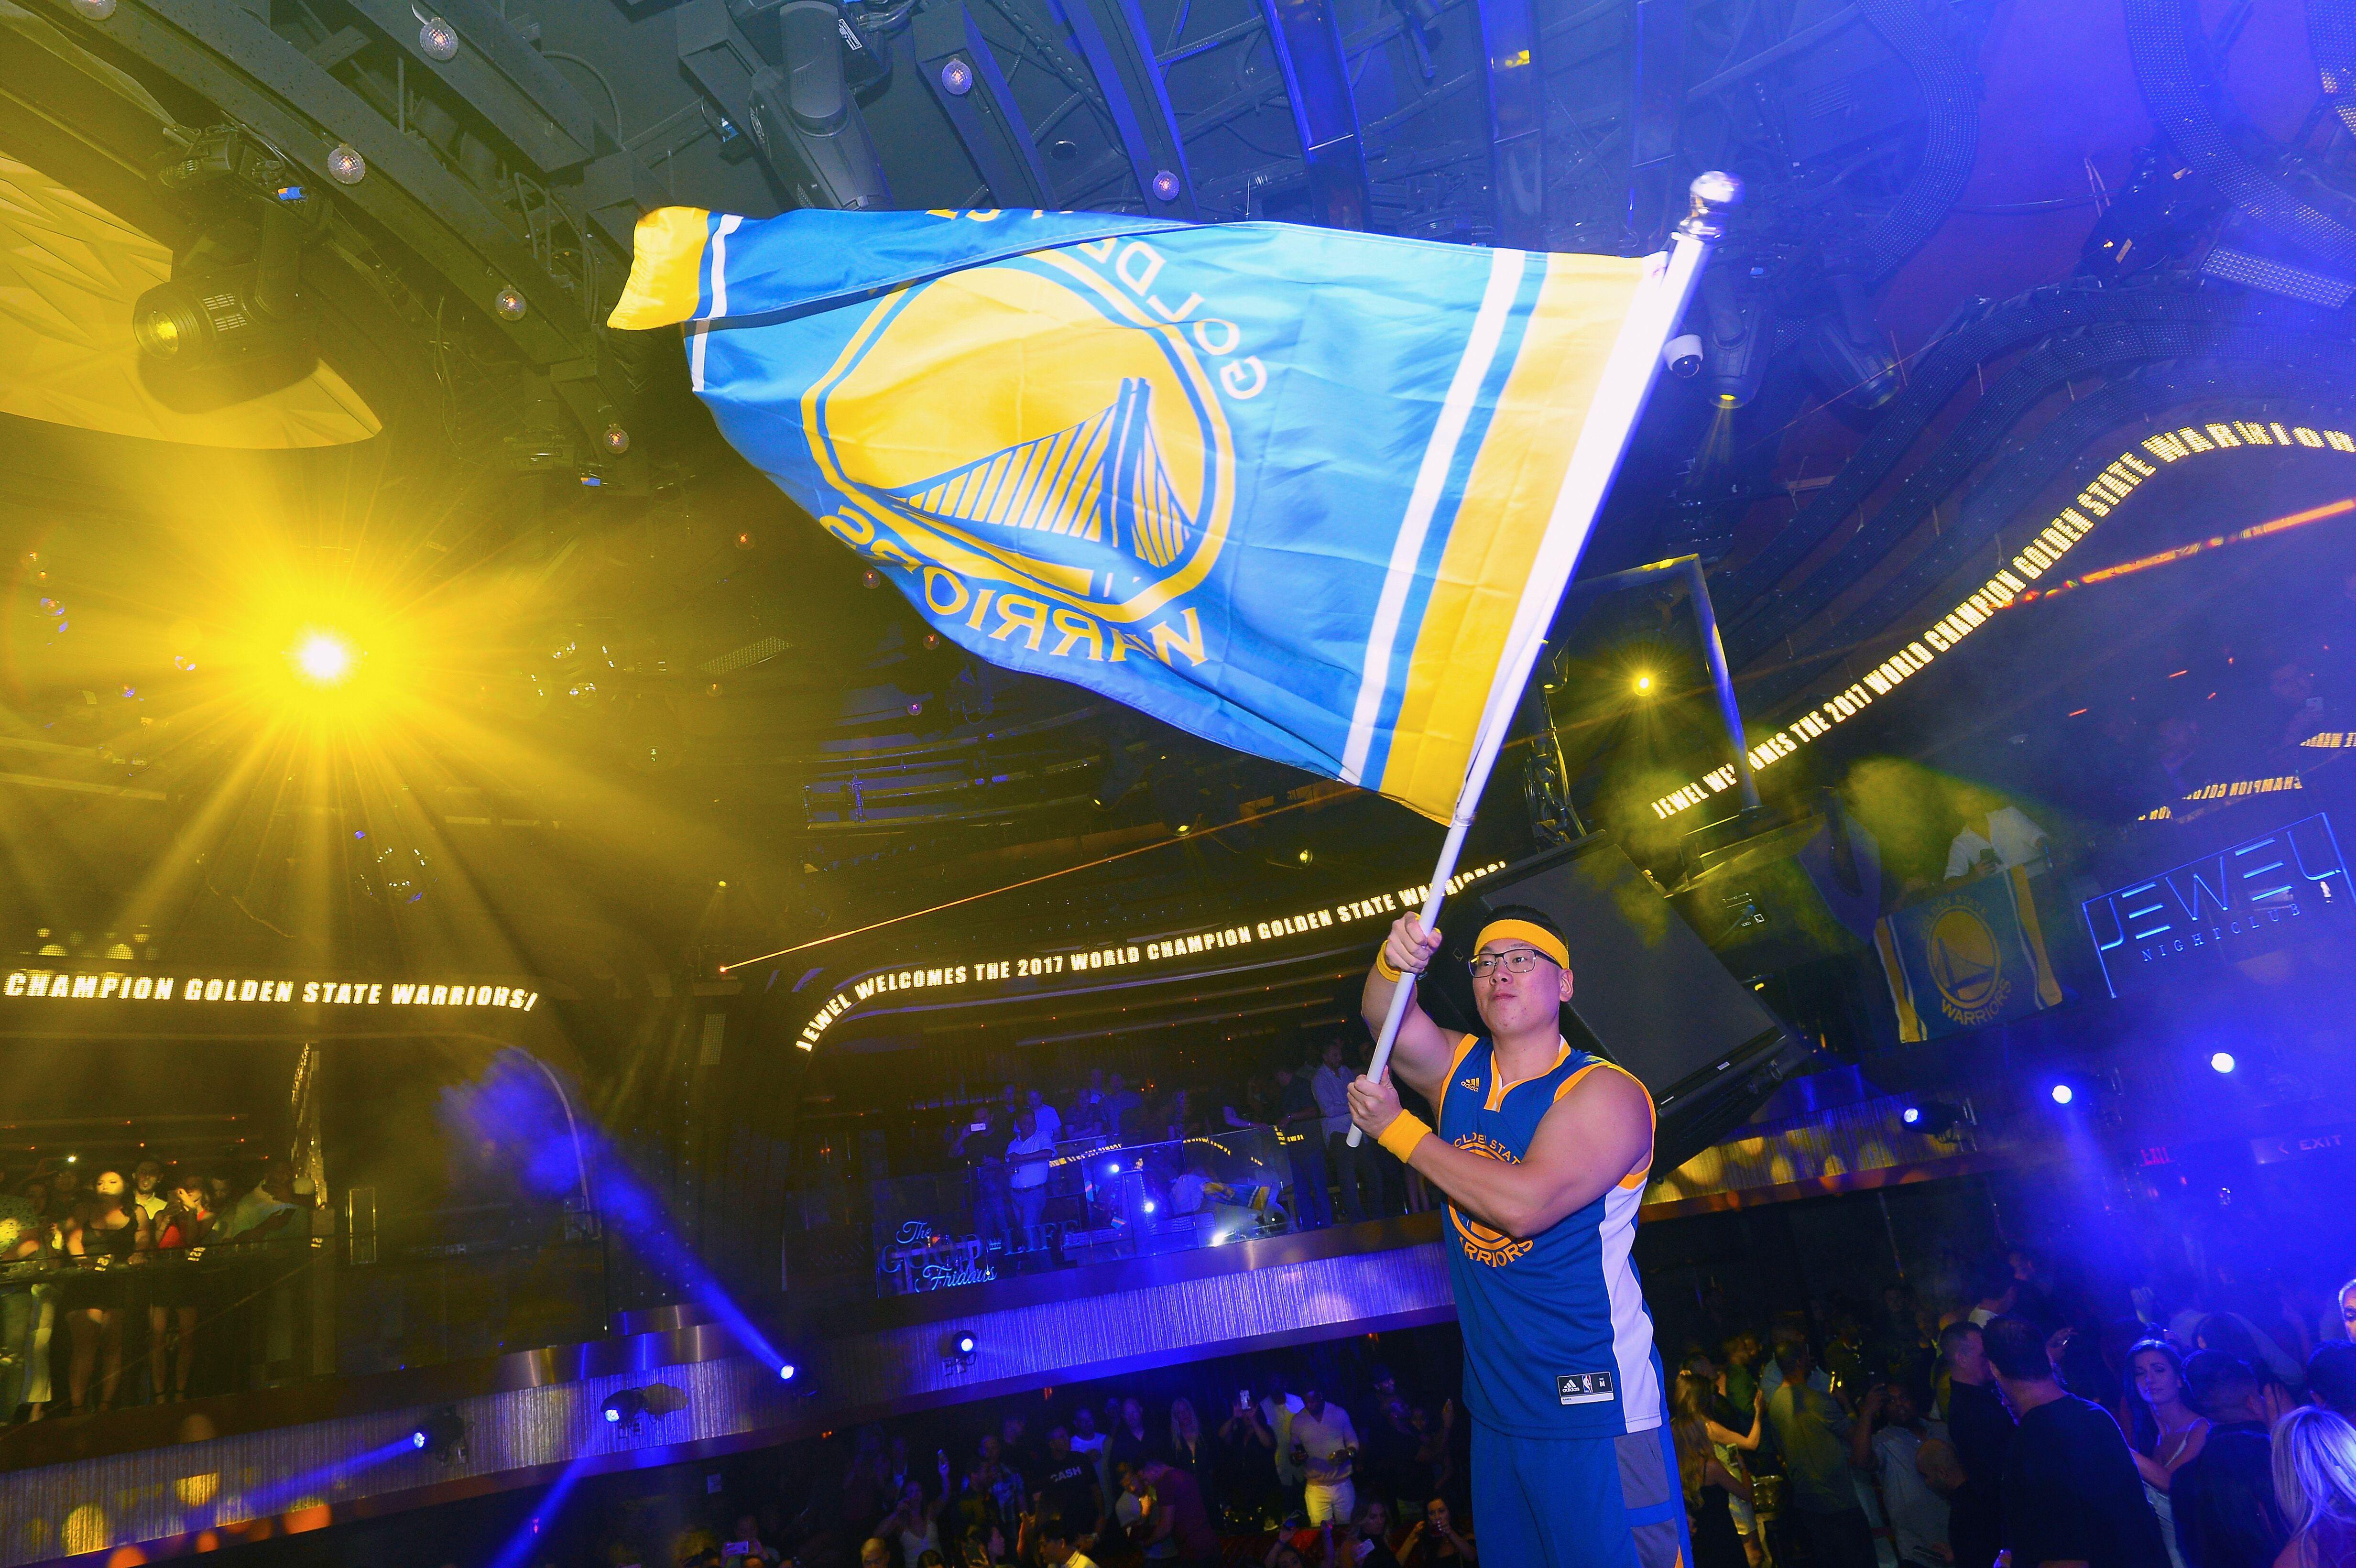 696843044-golden-state-warriors-celebrate-nba-championship-at-jewel-nightclub-inside-aria-resort.jpg